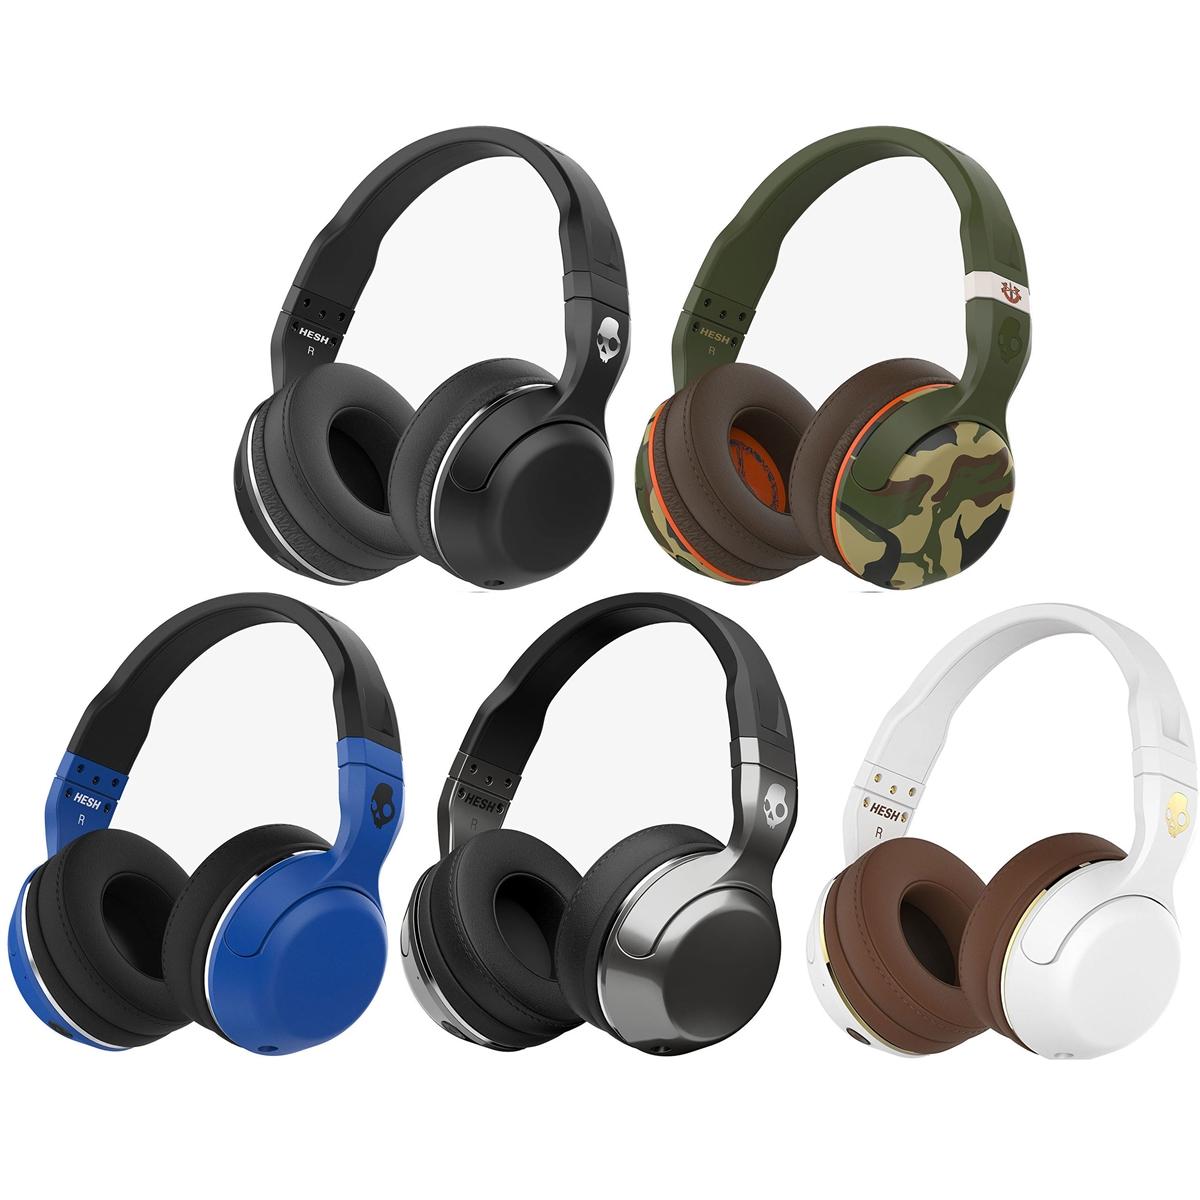 Skullcandy Hesh 2 Wireless Headphones Headphone Jack Wiring Diagram